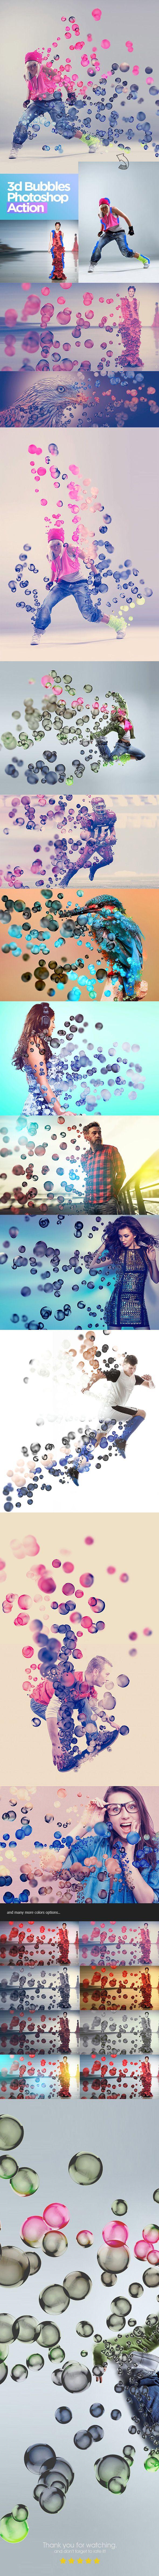 3D Bubbles Photoshop Action - Photo Effects Actions Download here: https://graphicriver.net/item/3d-bubbles-photoshop-action/19772266?ref=classicdesignp